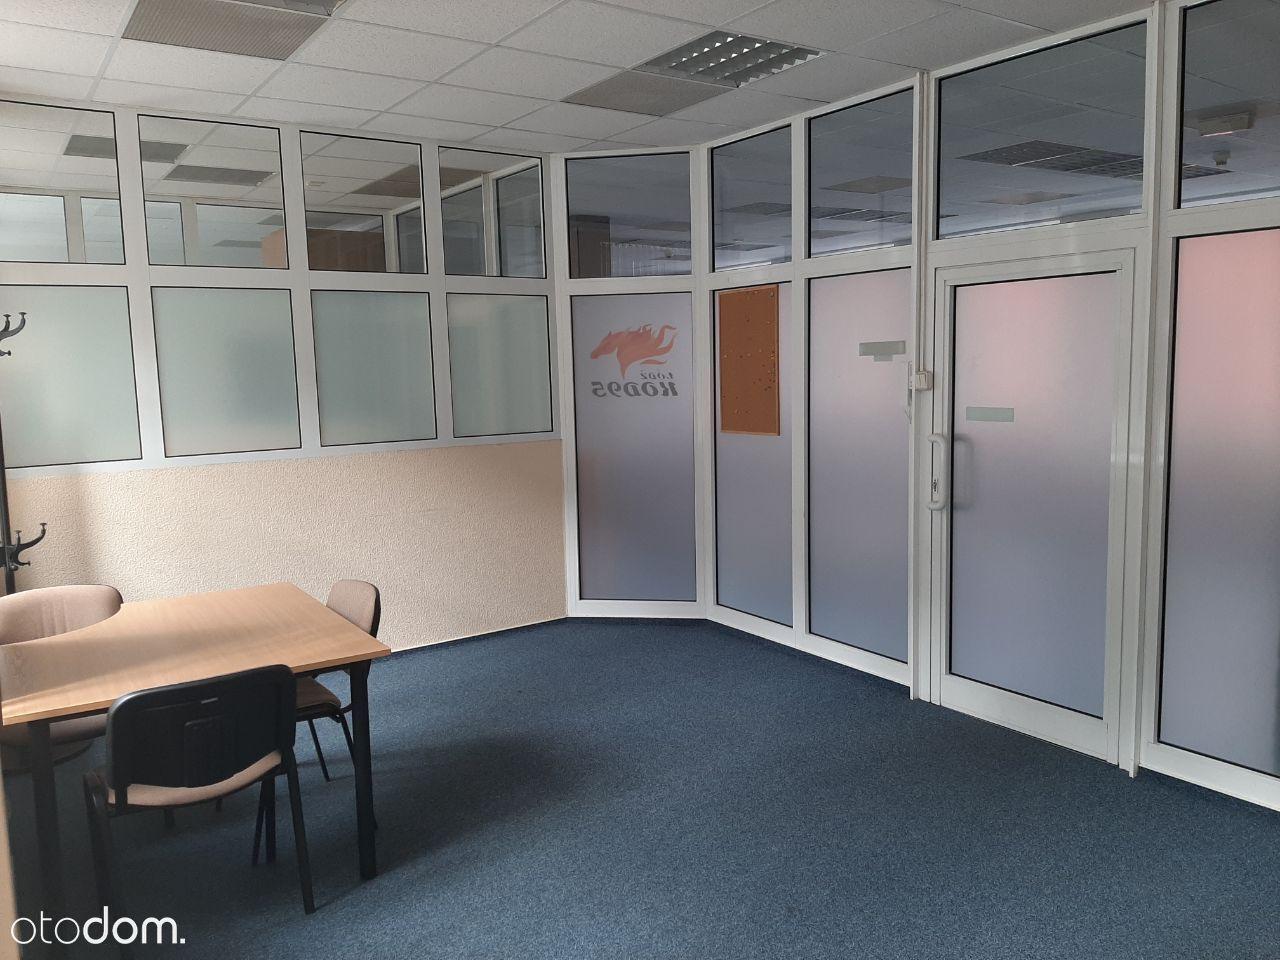 Lokale biurowe 15 m2, 25, 28, 40, możliwy parking